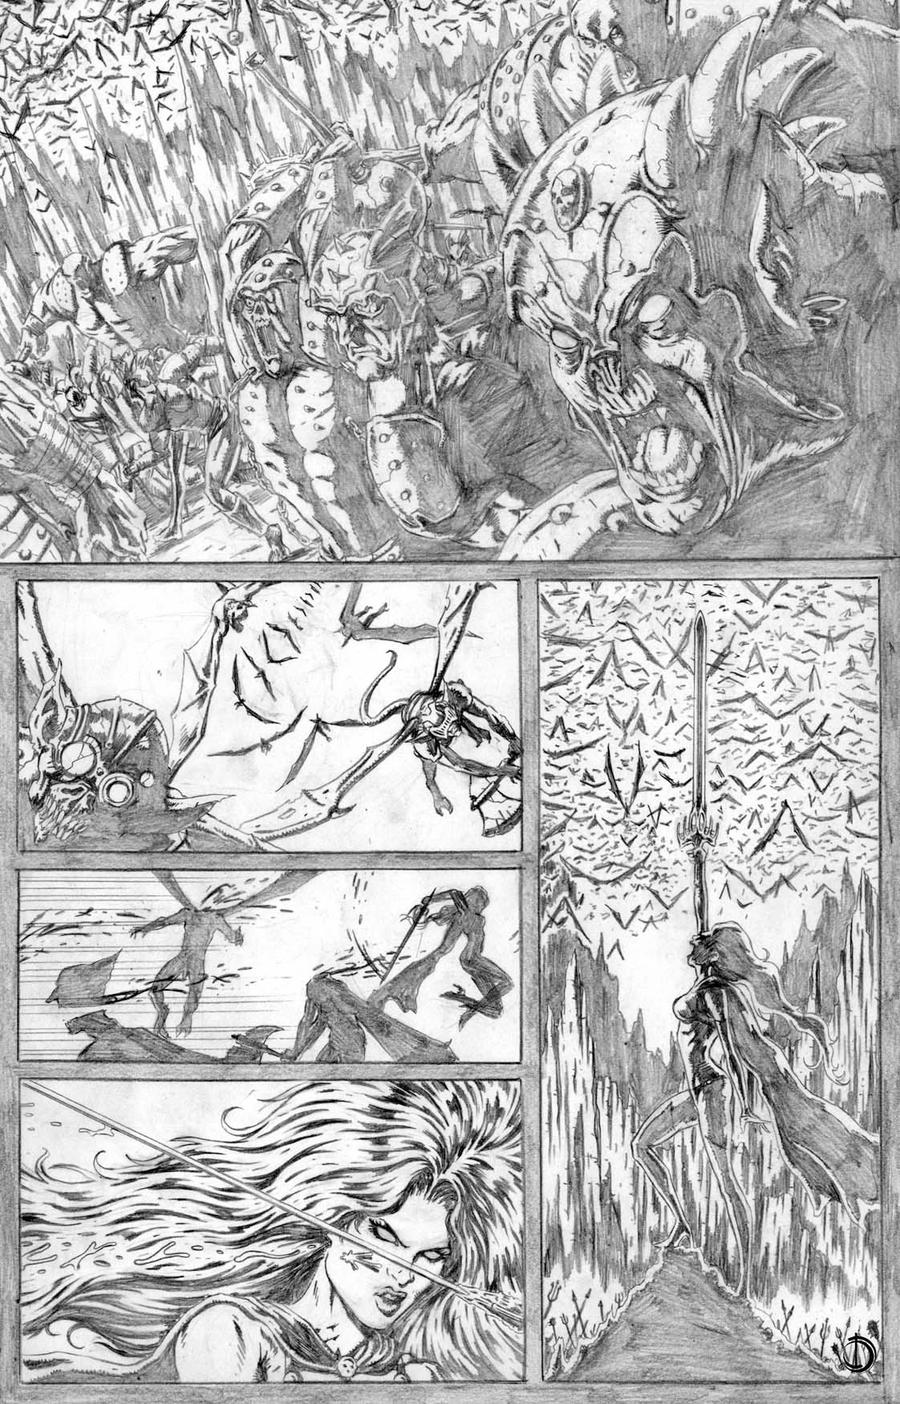 Lady Death page 01 by santiagocomics